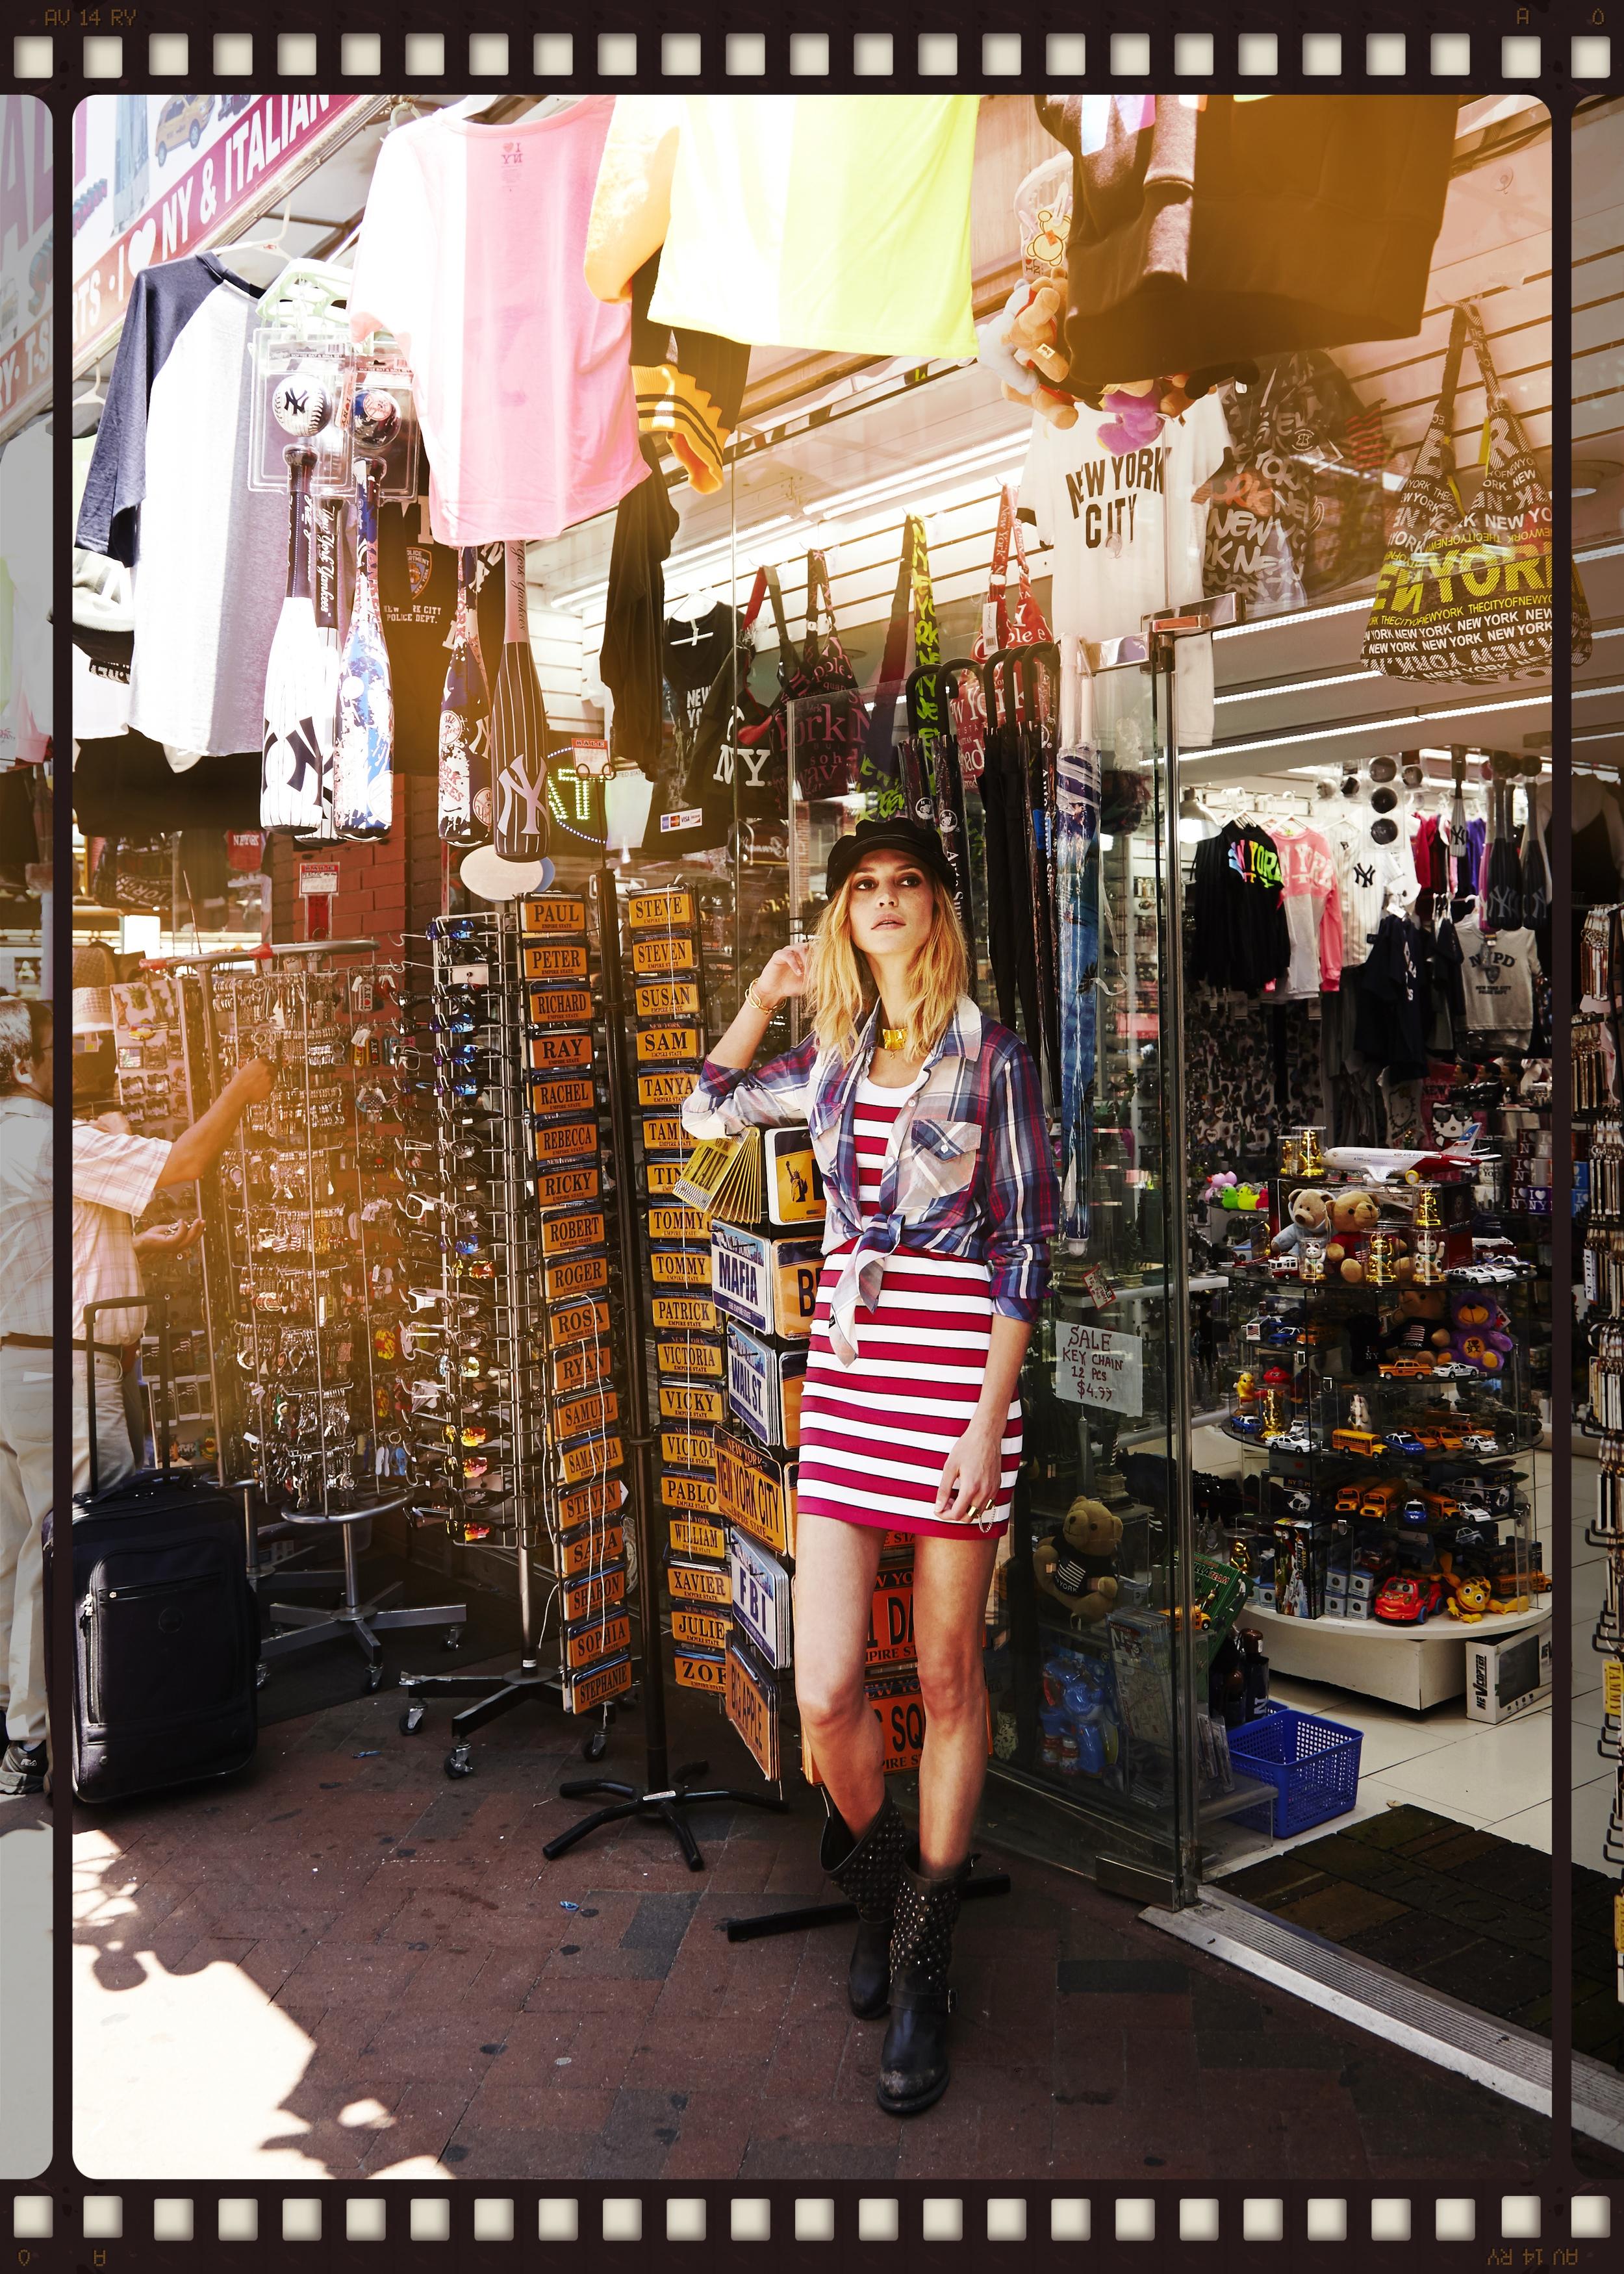 EstherHouston_NYC_JUNE2015_575.jpg